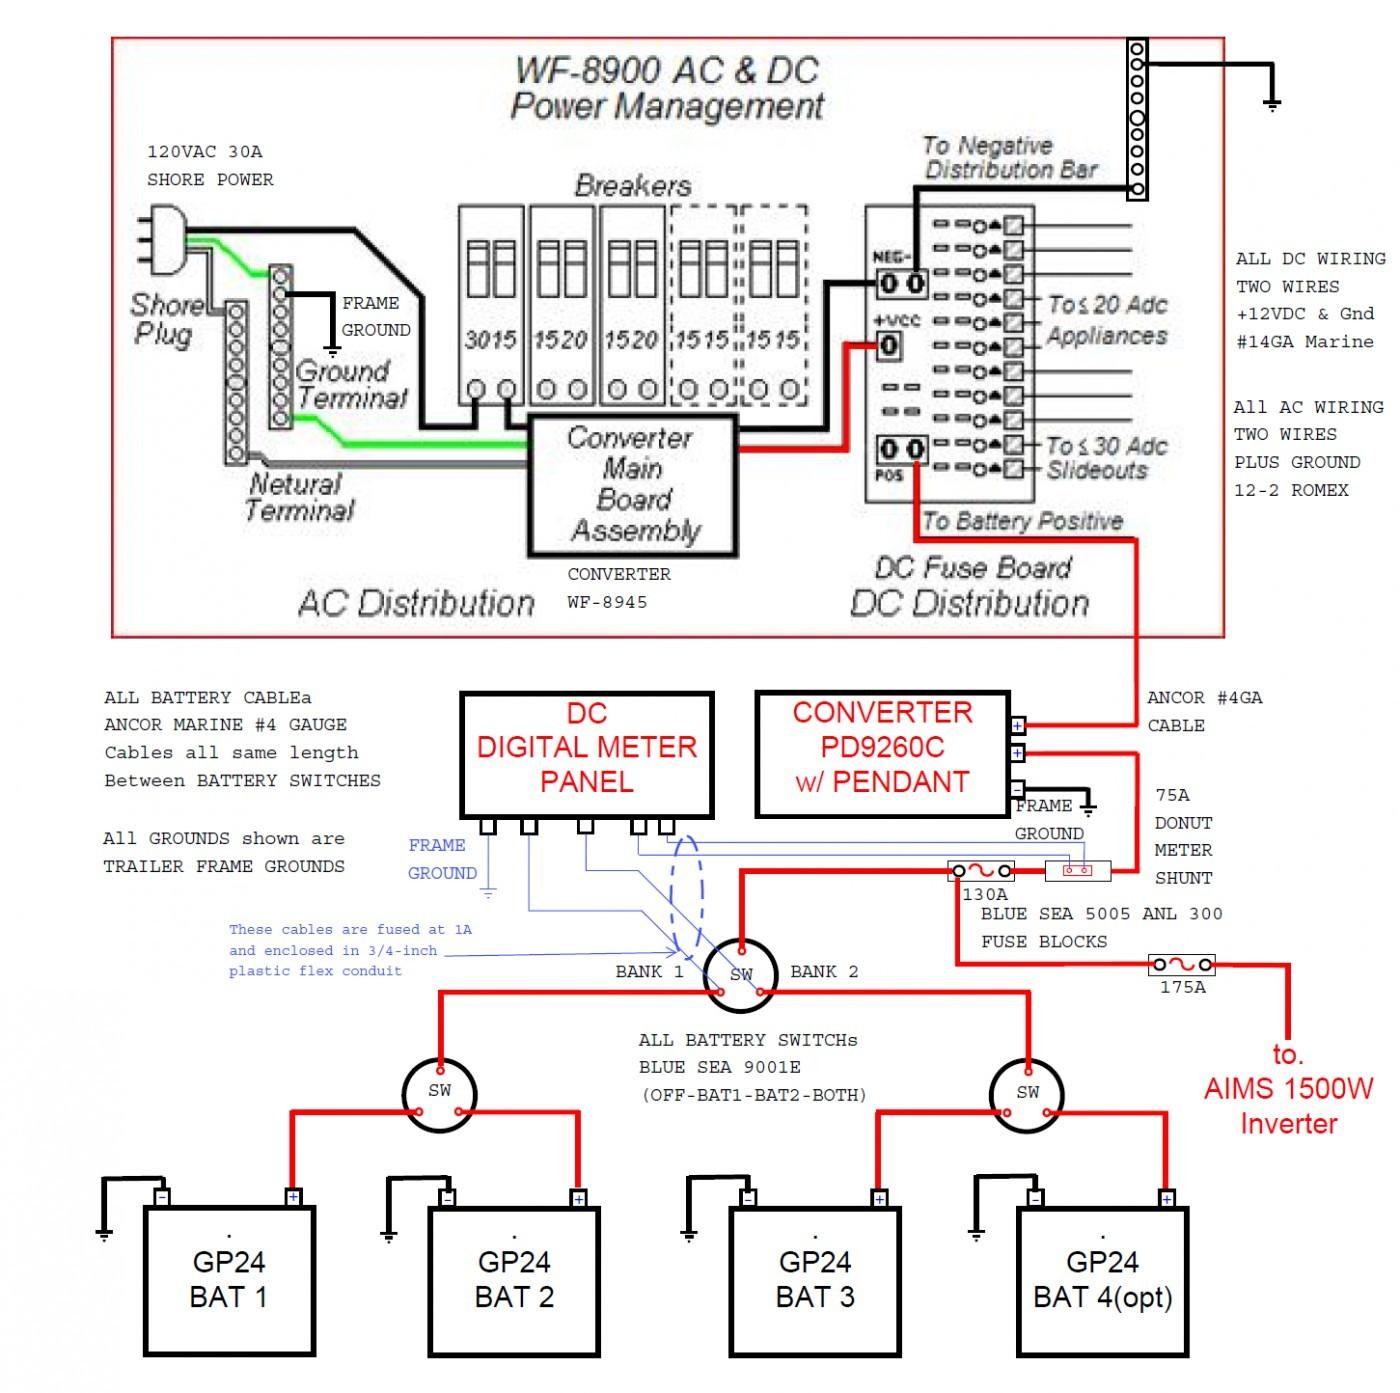 wiring diagram for coleman popup camper: coleman wiring schematic wiring  diagramsrh:y yfmv